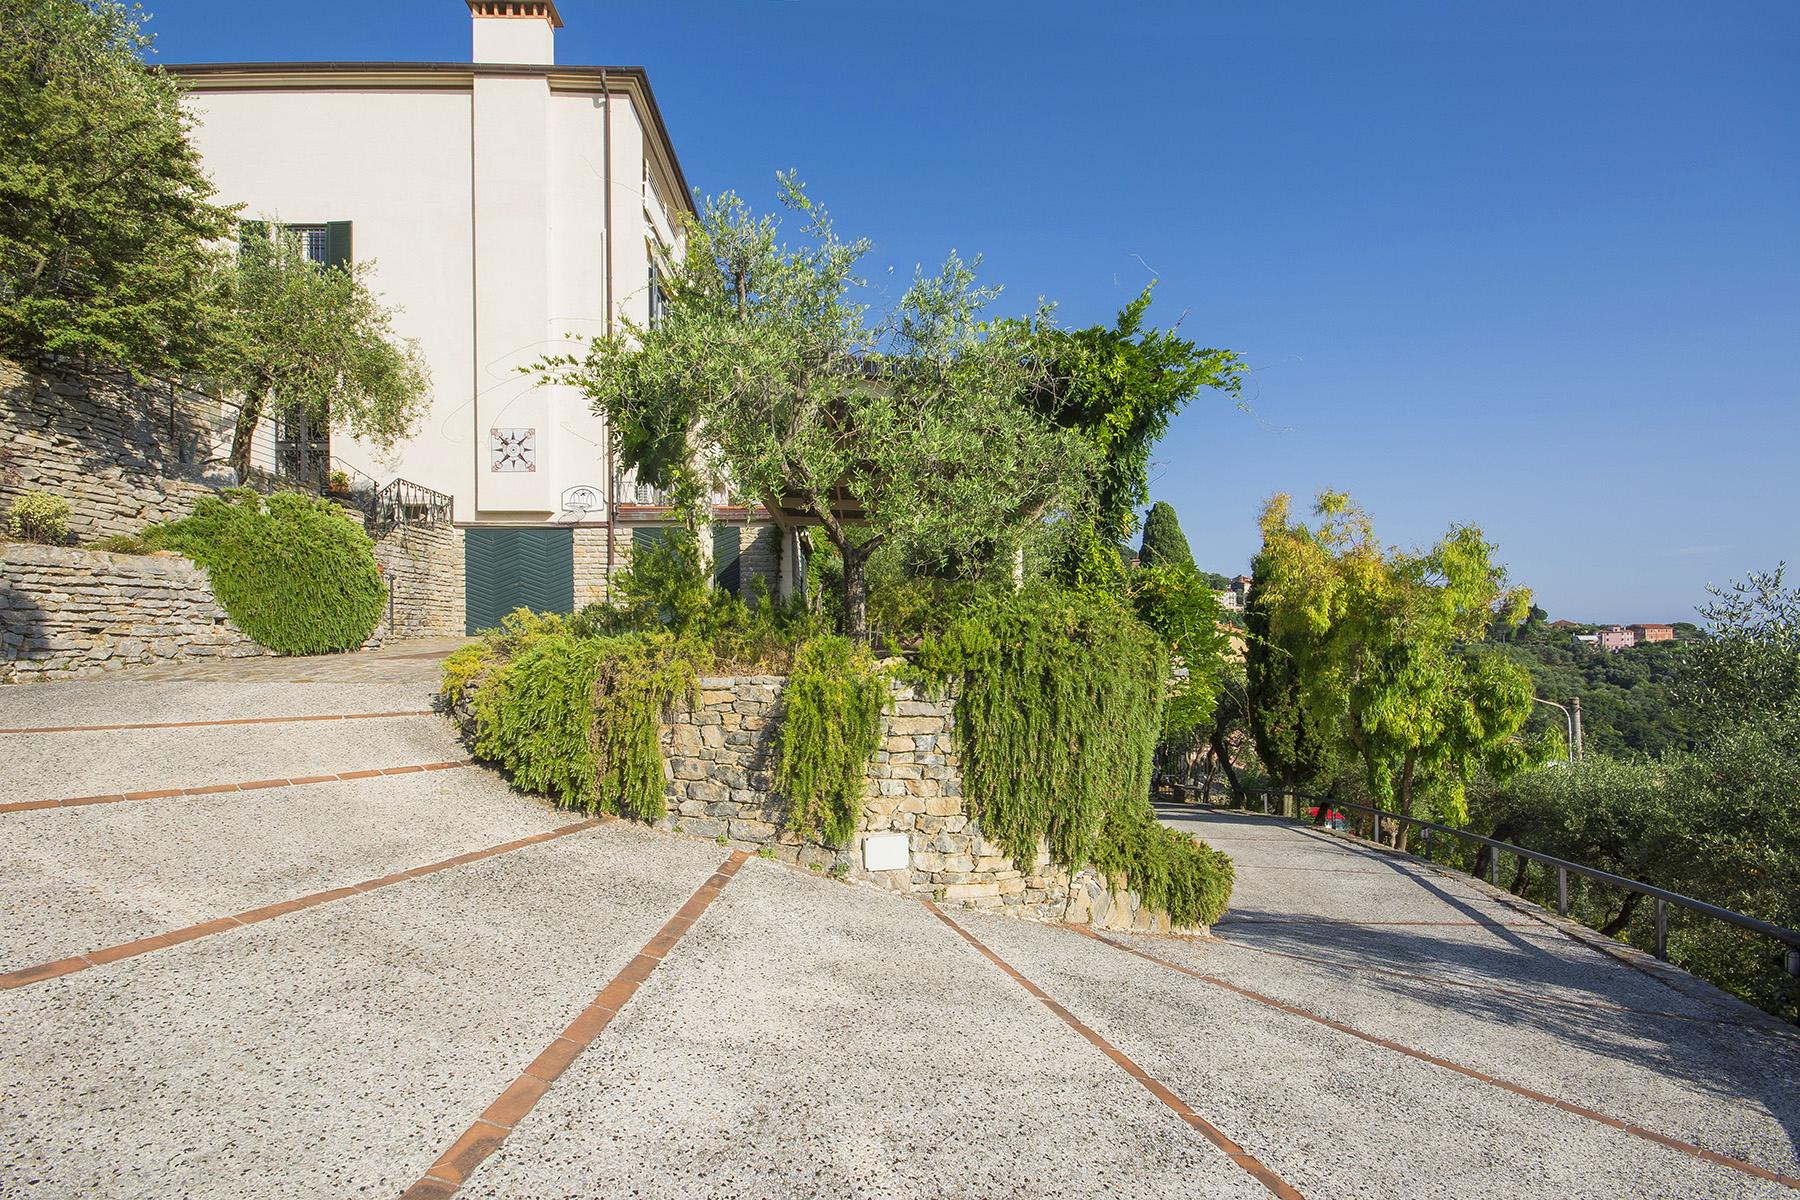 Villa in Vendita a Lerici: 5 locali, 580 mq - Foto 3